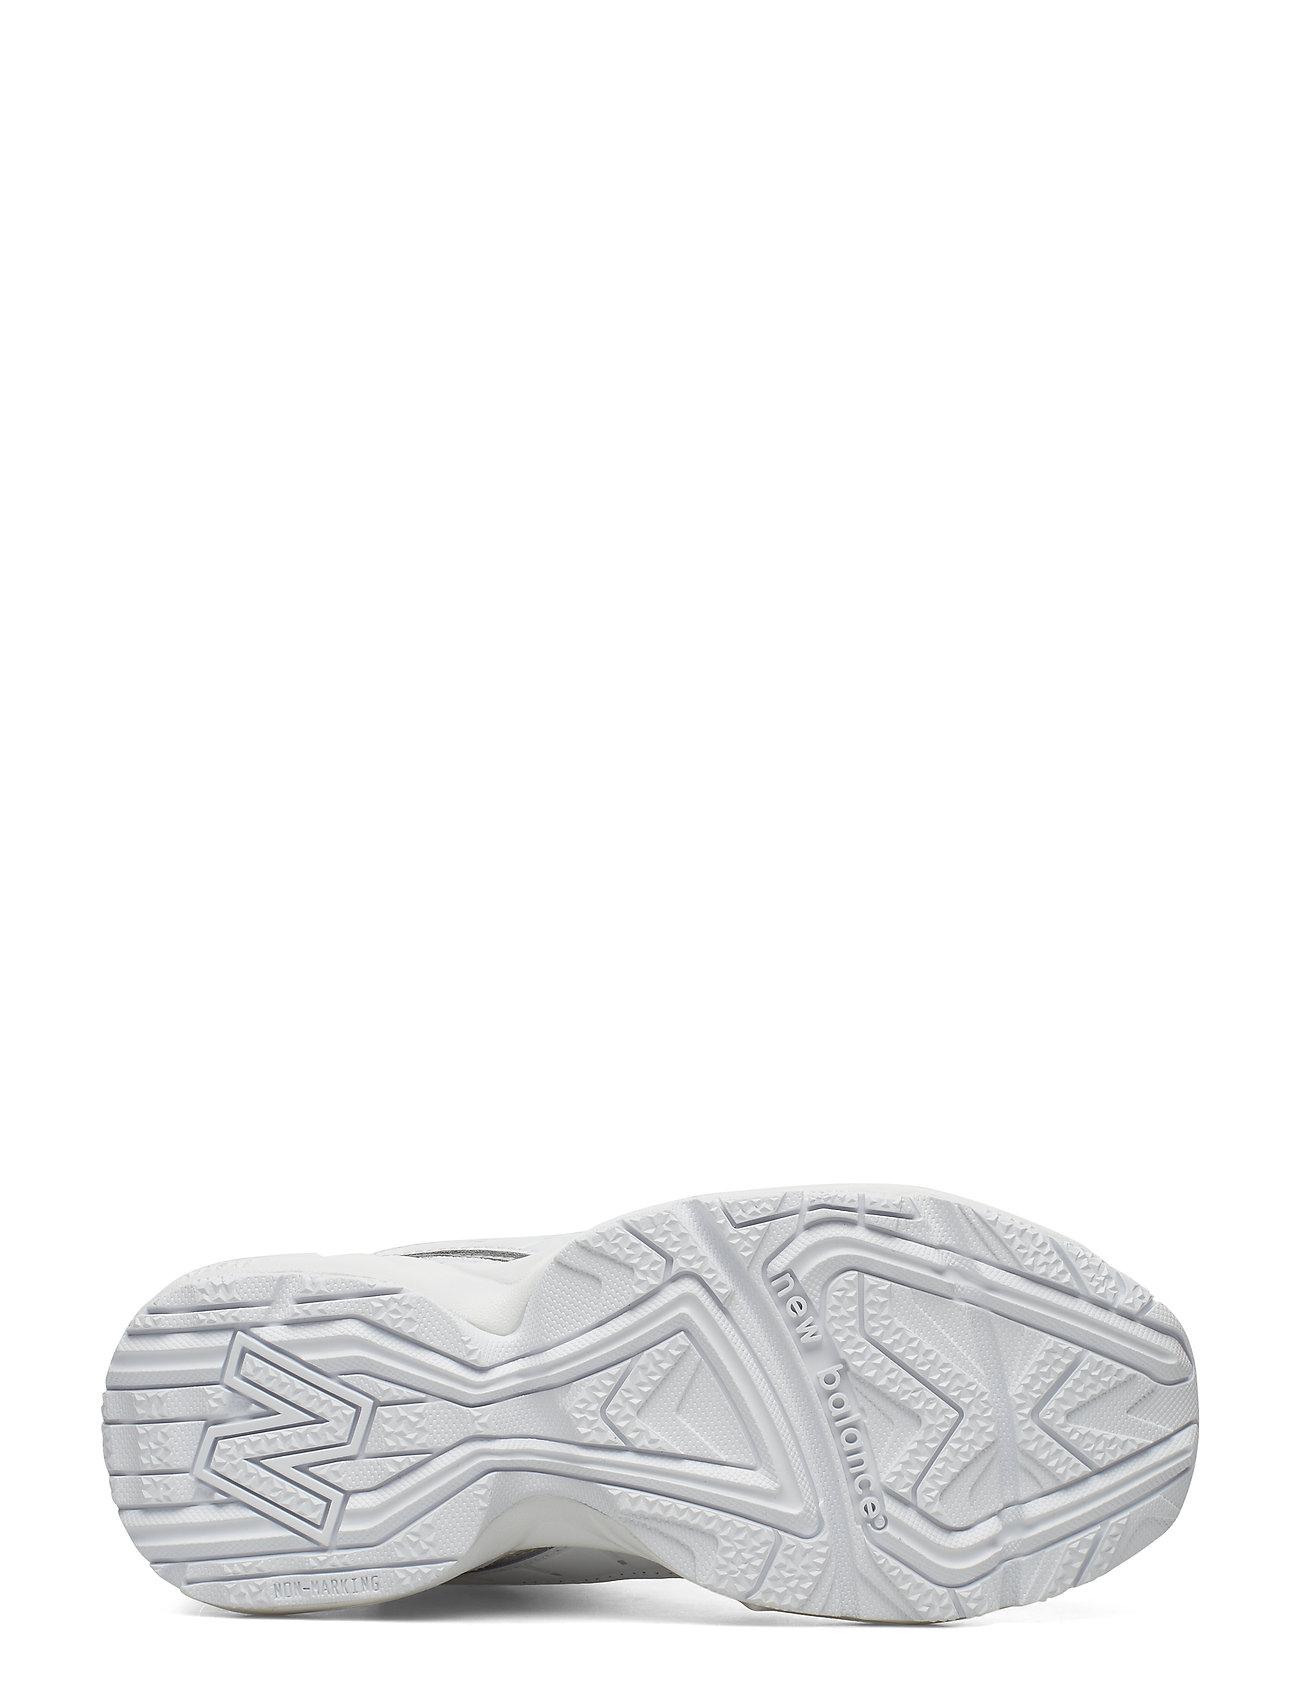 New Balance - WX452SG - white/grey - 7